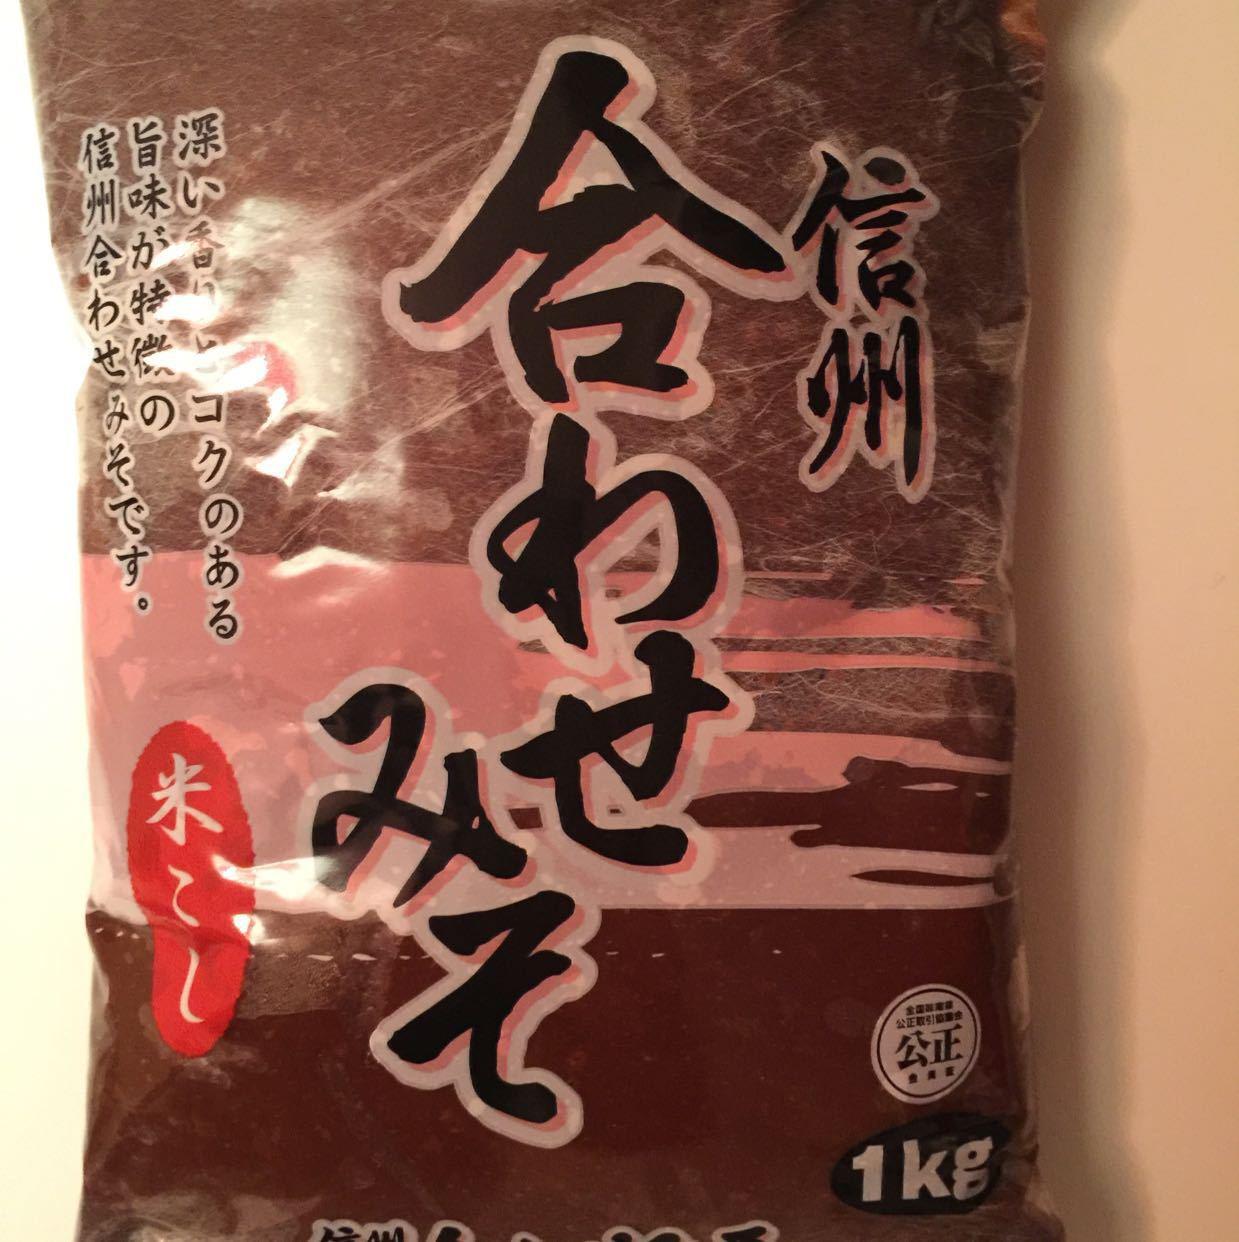 Hikari Shinshu Awase Miso 1kg